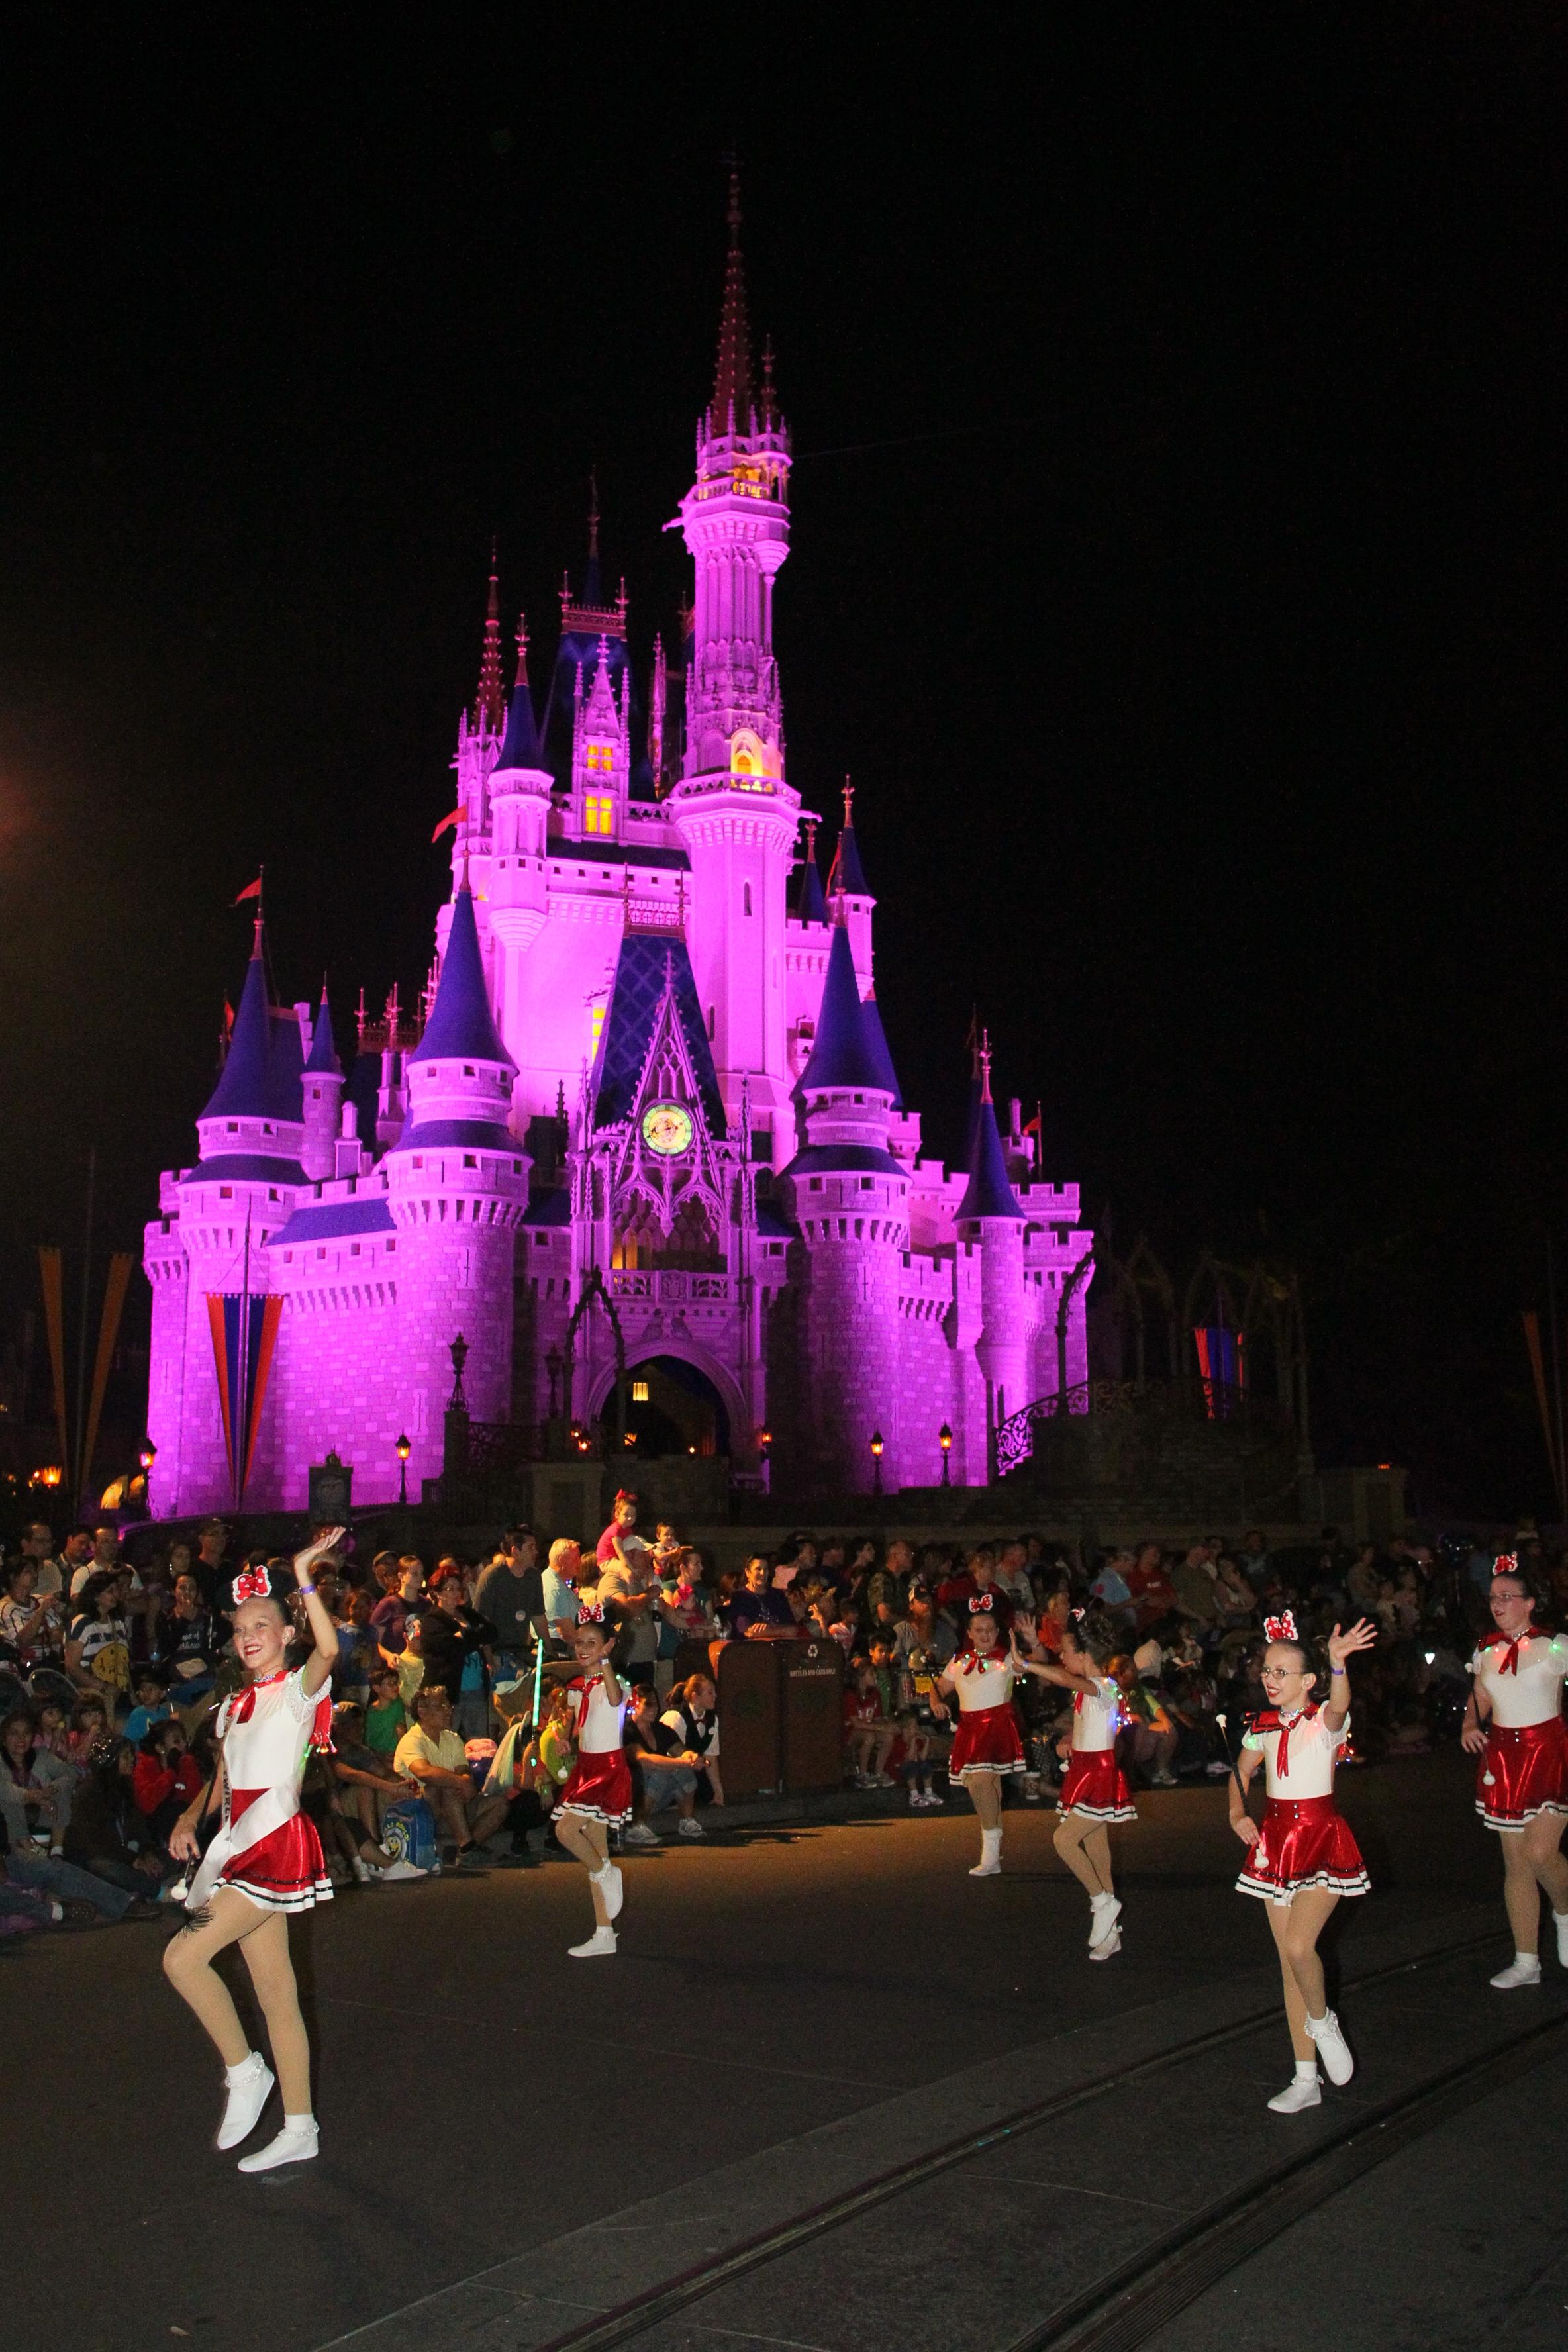 2012 Australian representatives parading in Magic kingdom